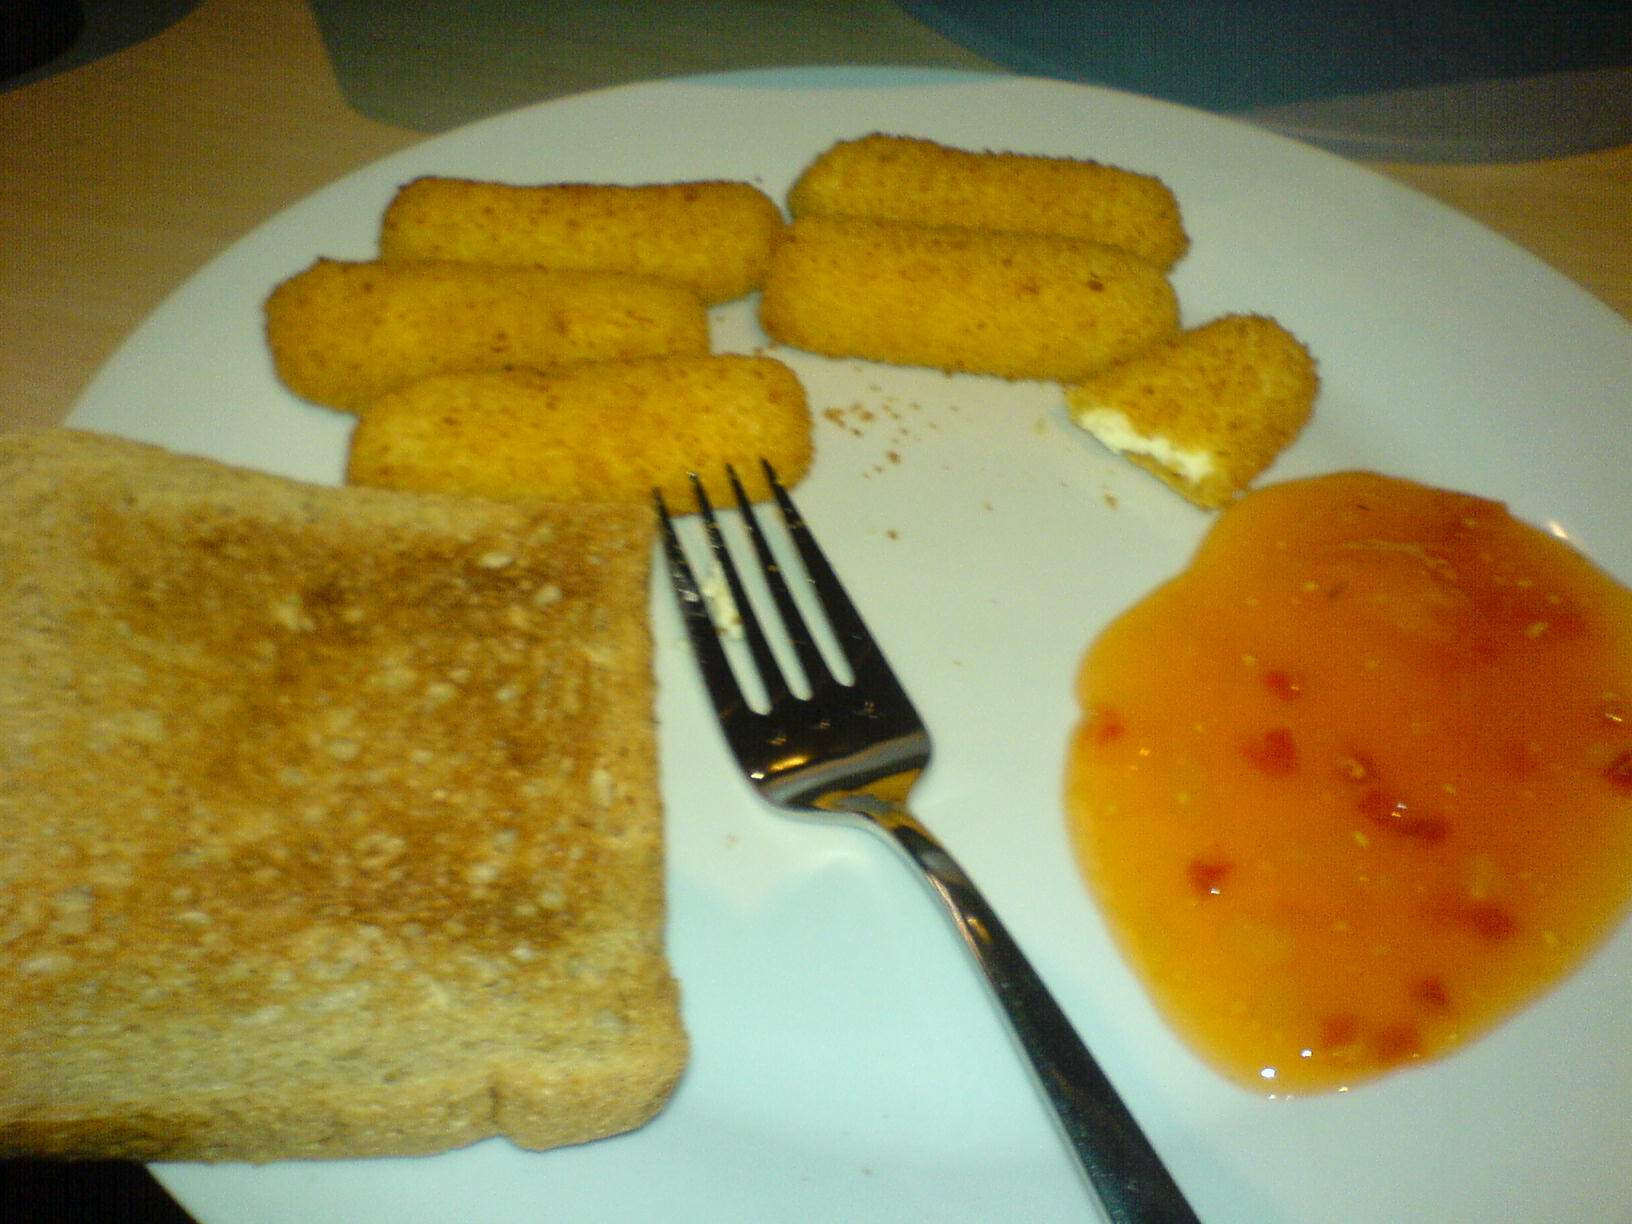 https://foodloader.net/Holz_2009-01-29_Frischkaese-Sticks_mit_Toast.jpg